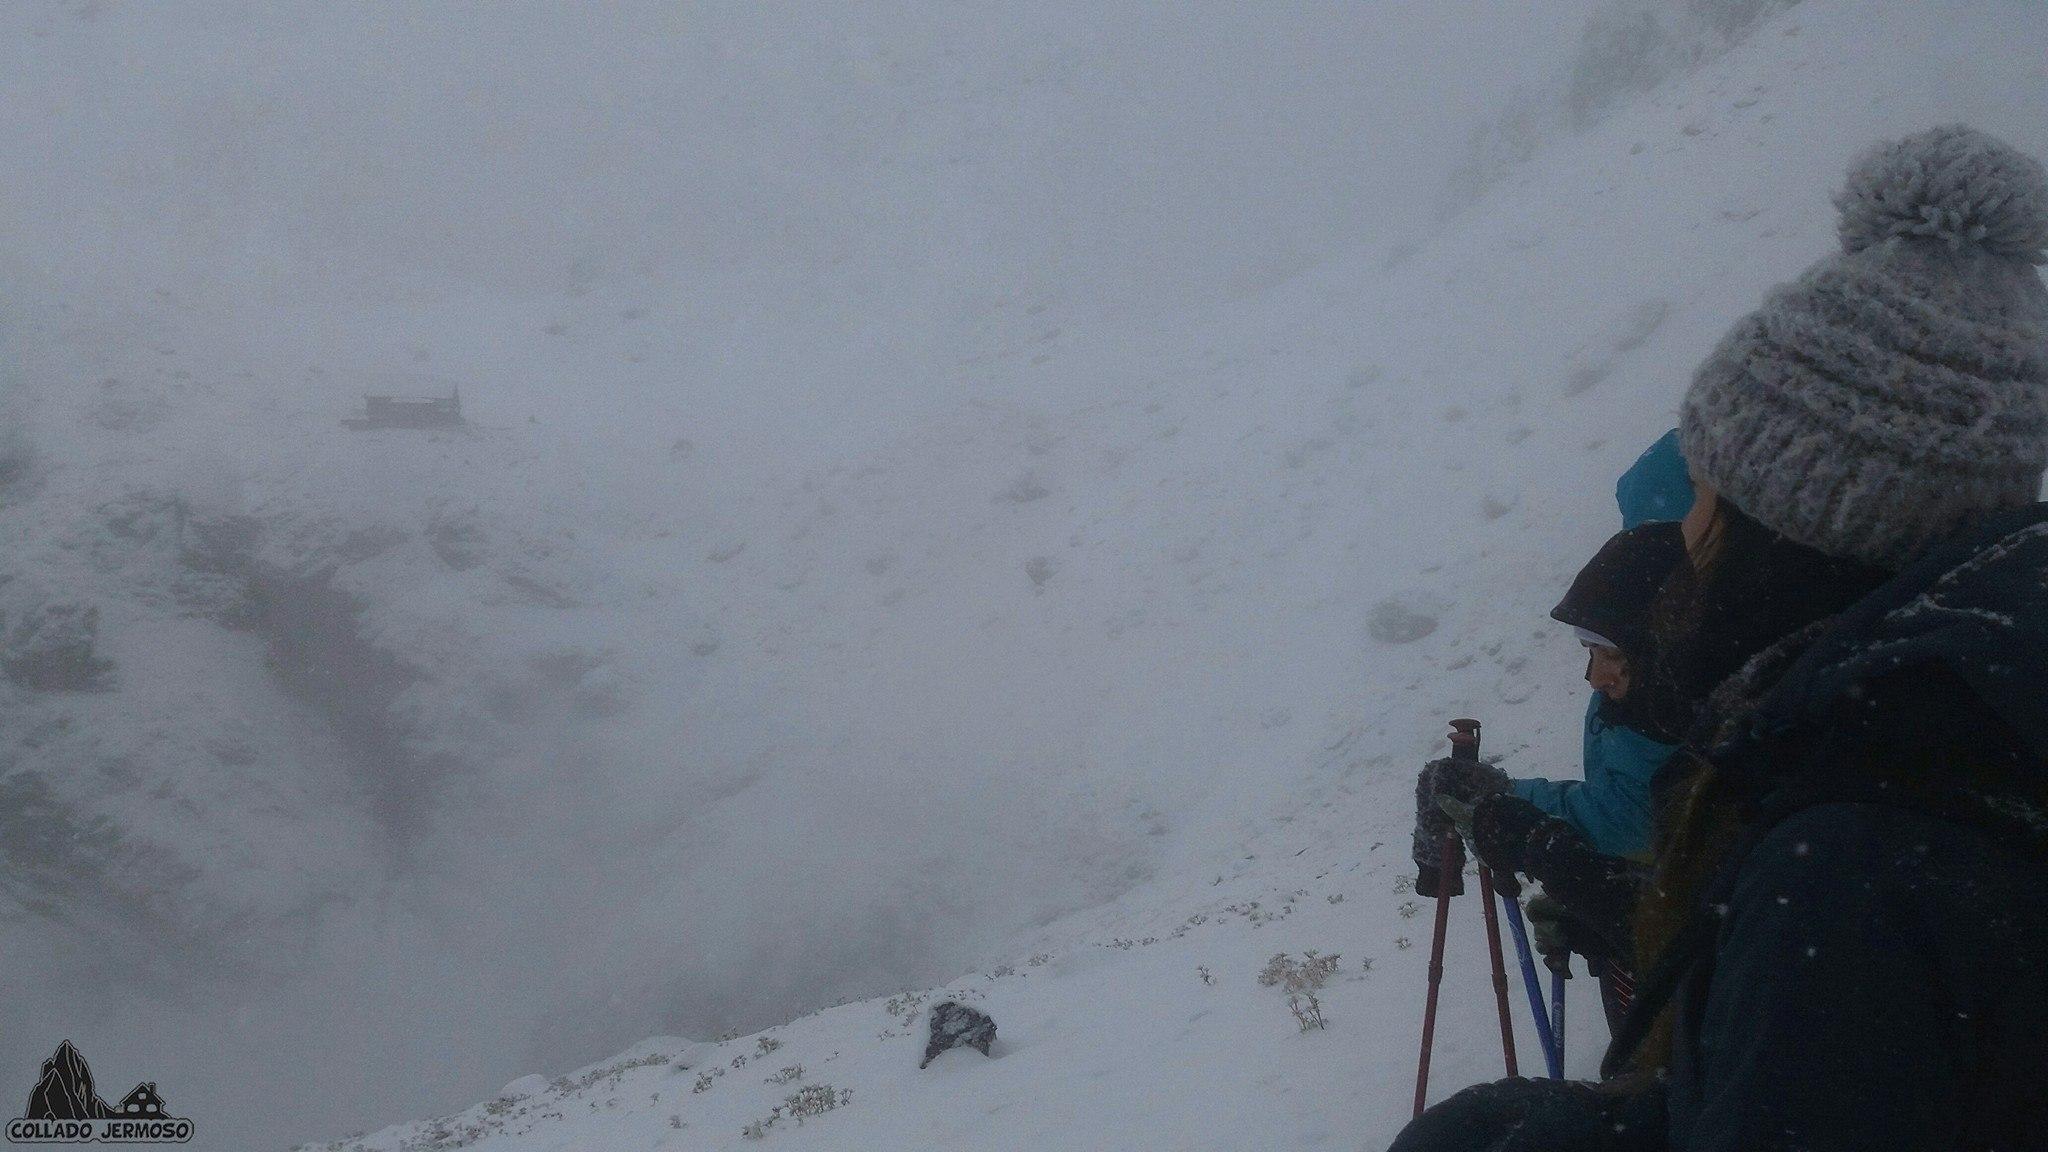 La nieve llega a la provincia de León